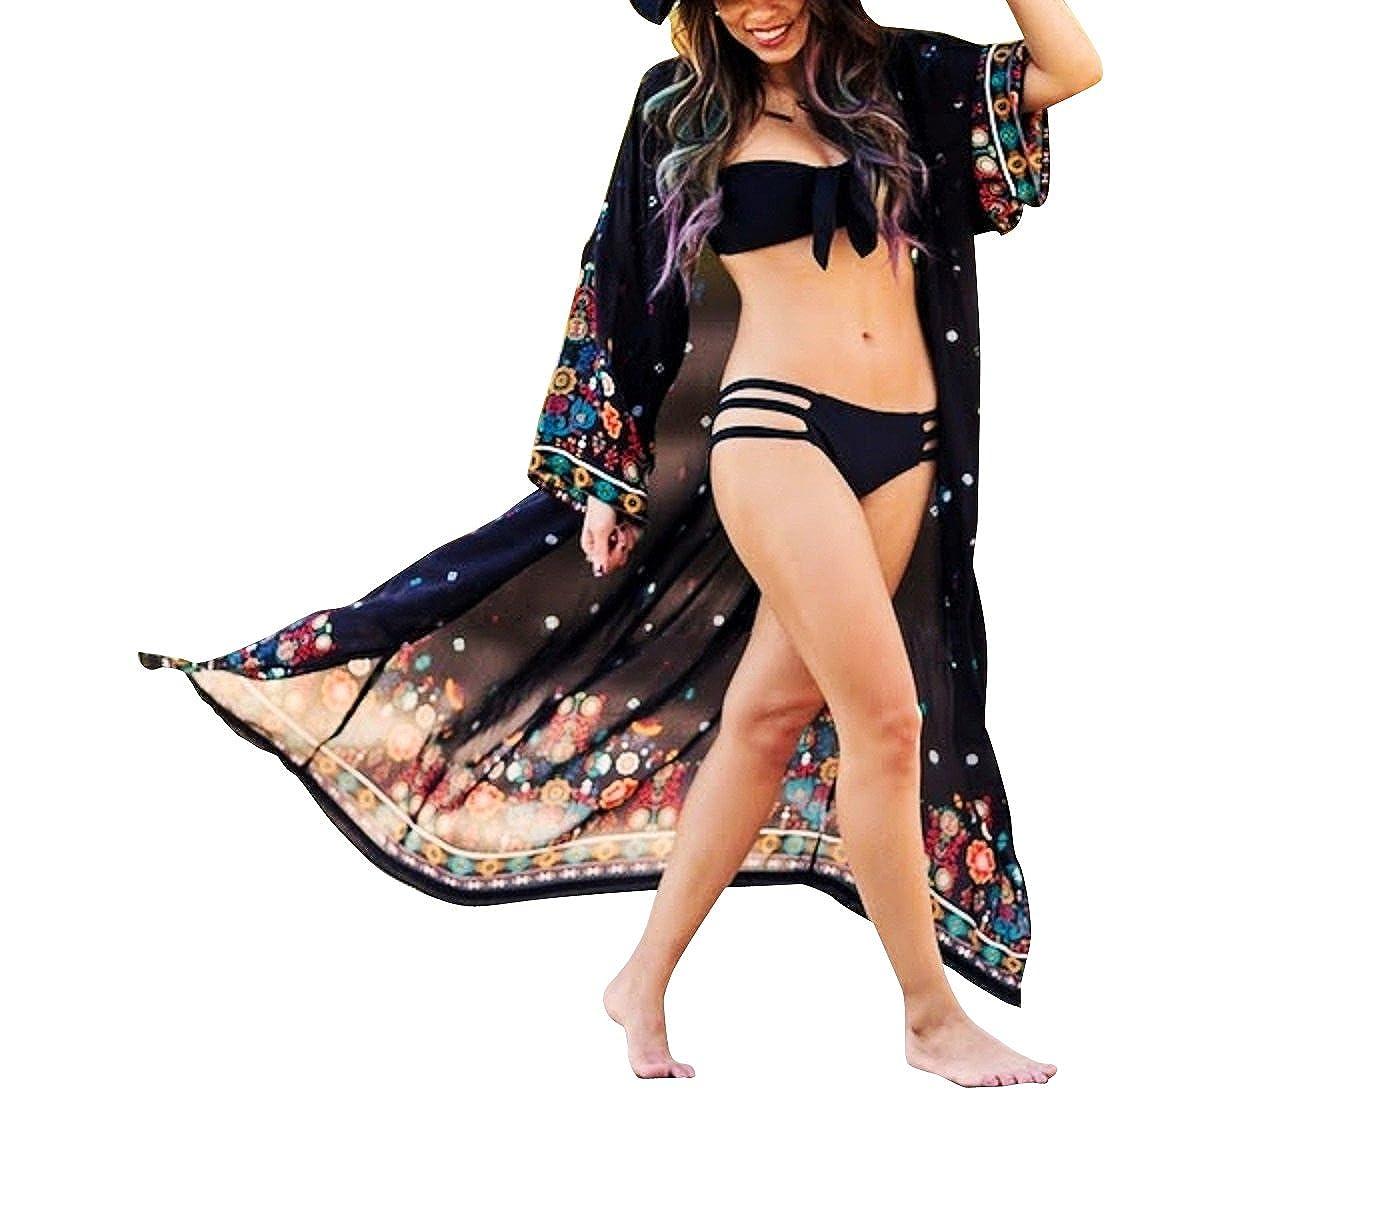 Women's Clothing Women Lace Embroidery Kimono Blouse Stylish Mesh Sheer See Through Beach Cardigan Bikini Cover Up Wrap Beachwear Long Blouse New Superior Materials